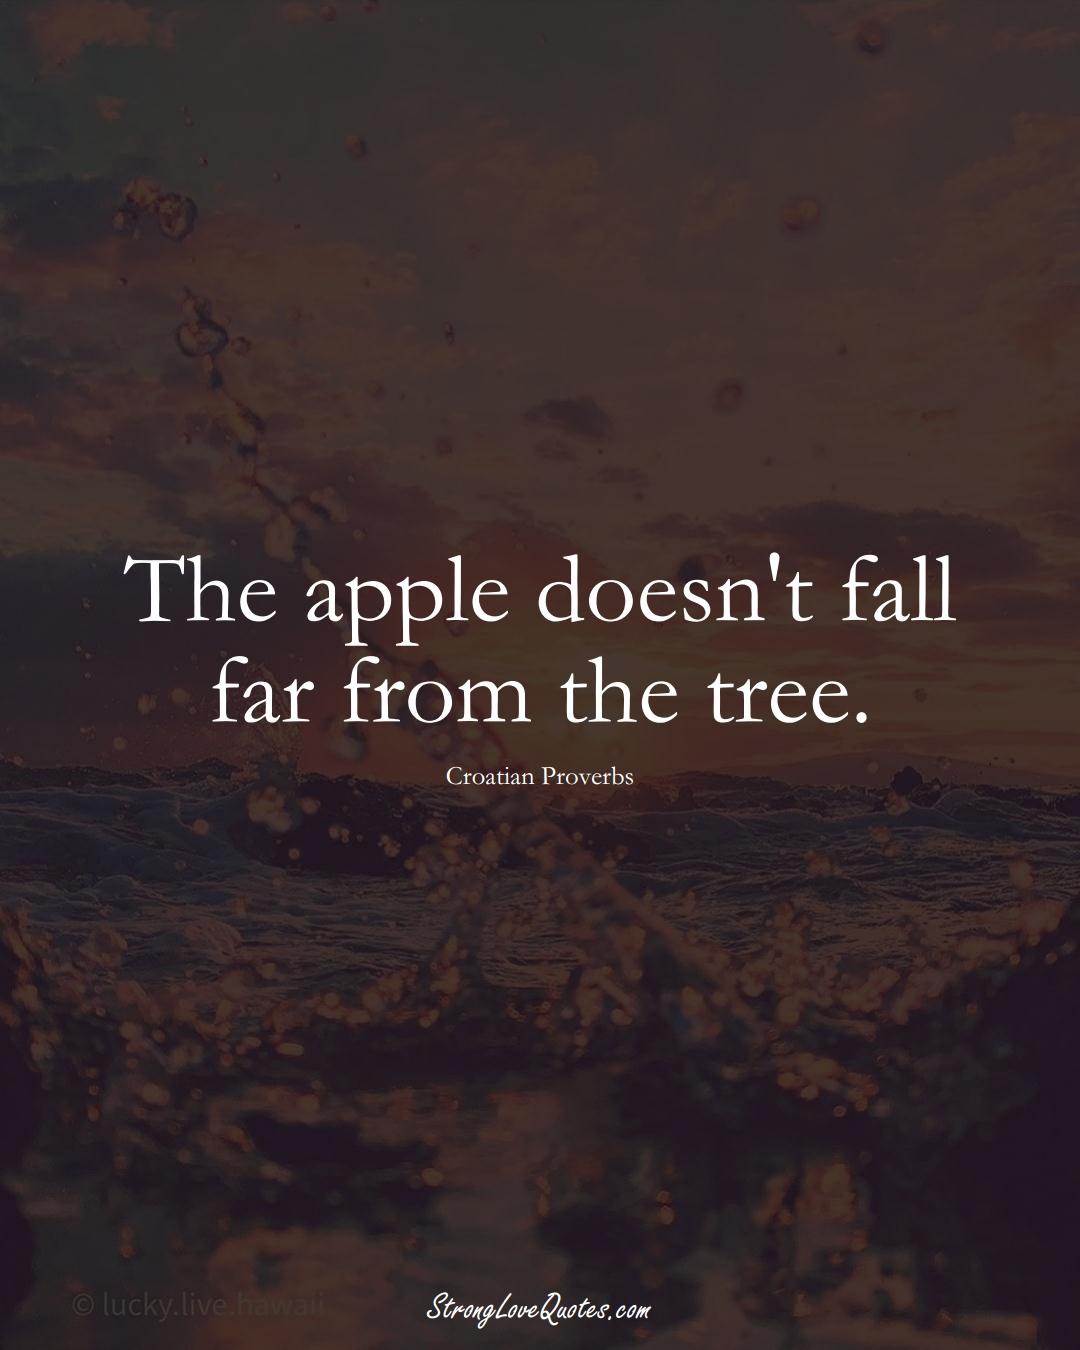 The apple doesn't fall far from the tree. (Croatian Sayings);  #EuropeanSayings